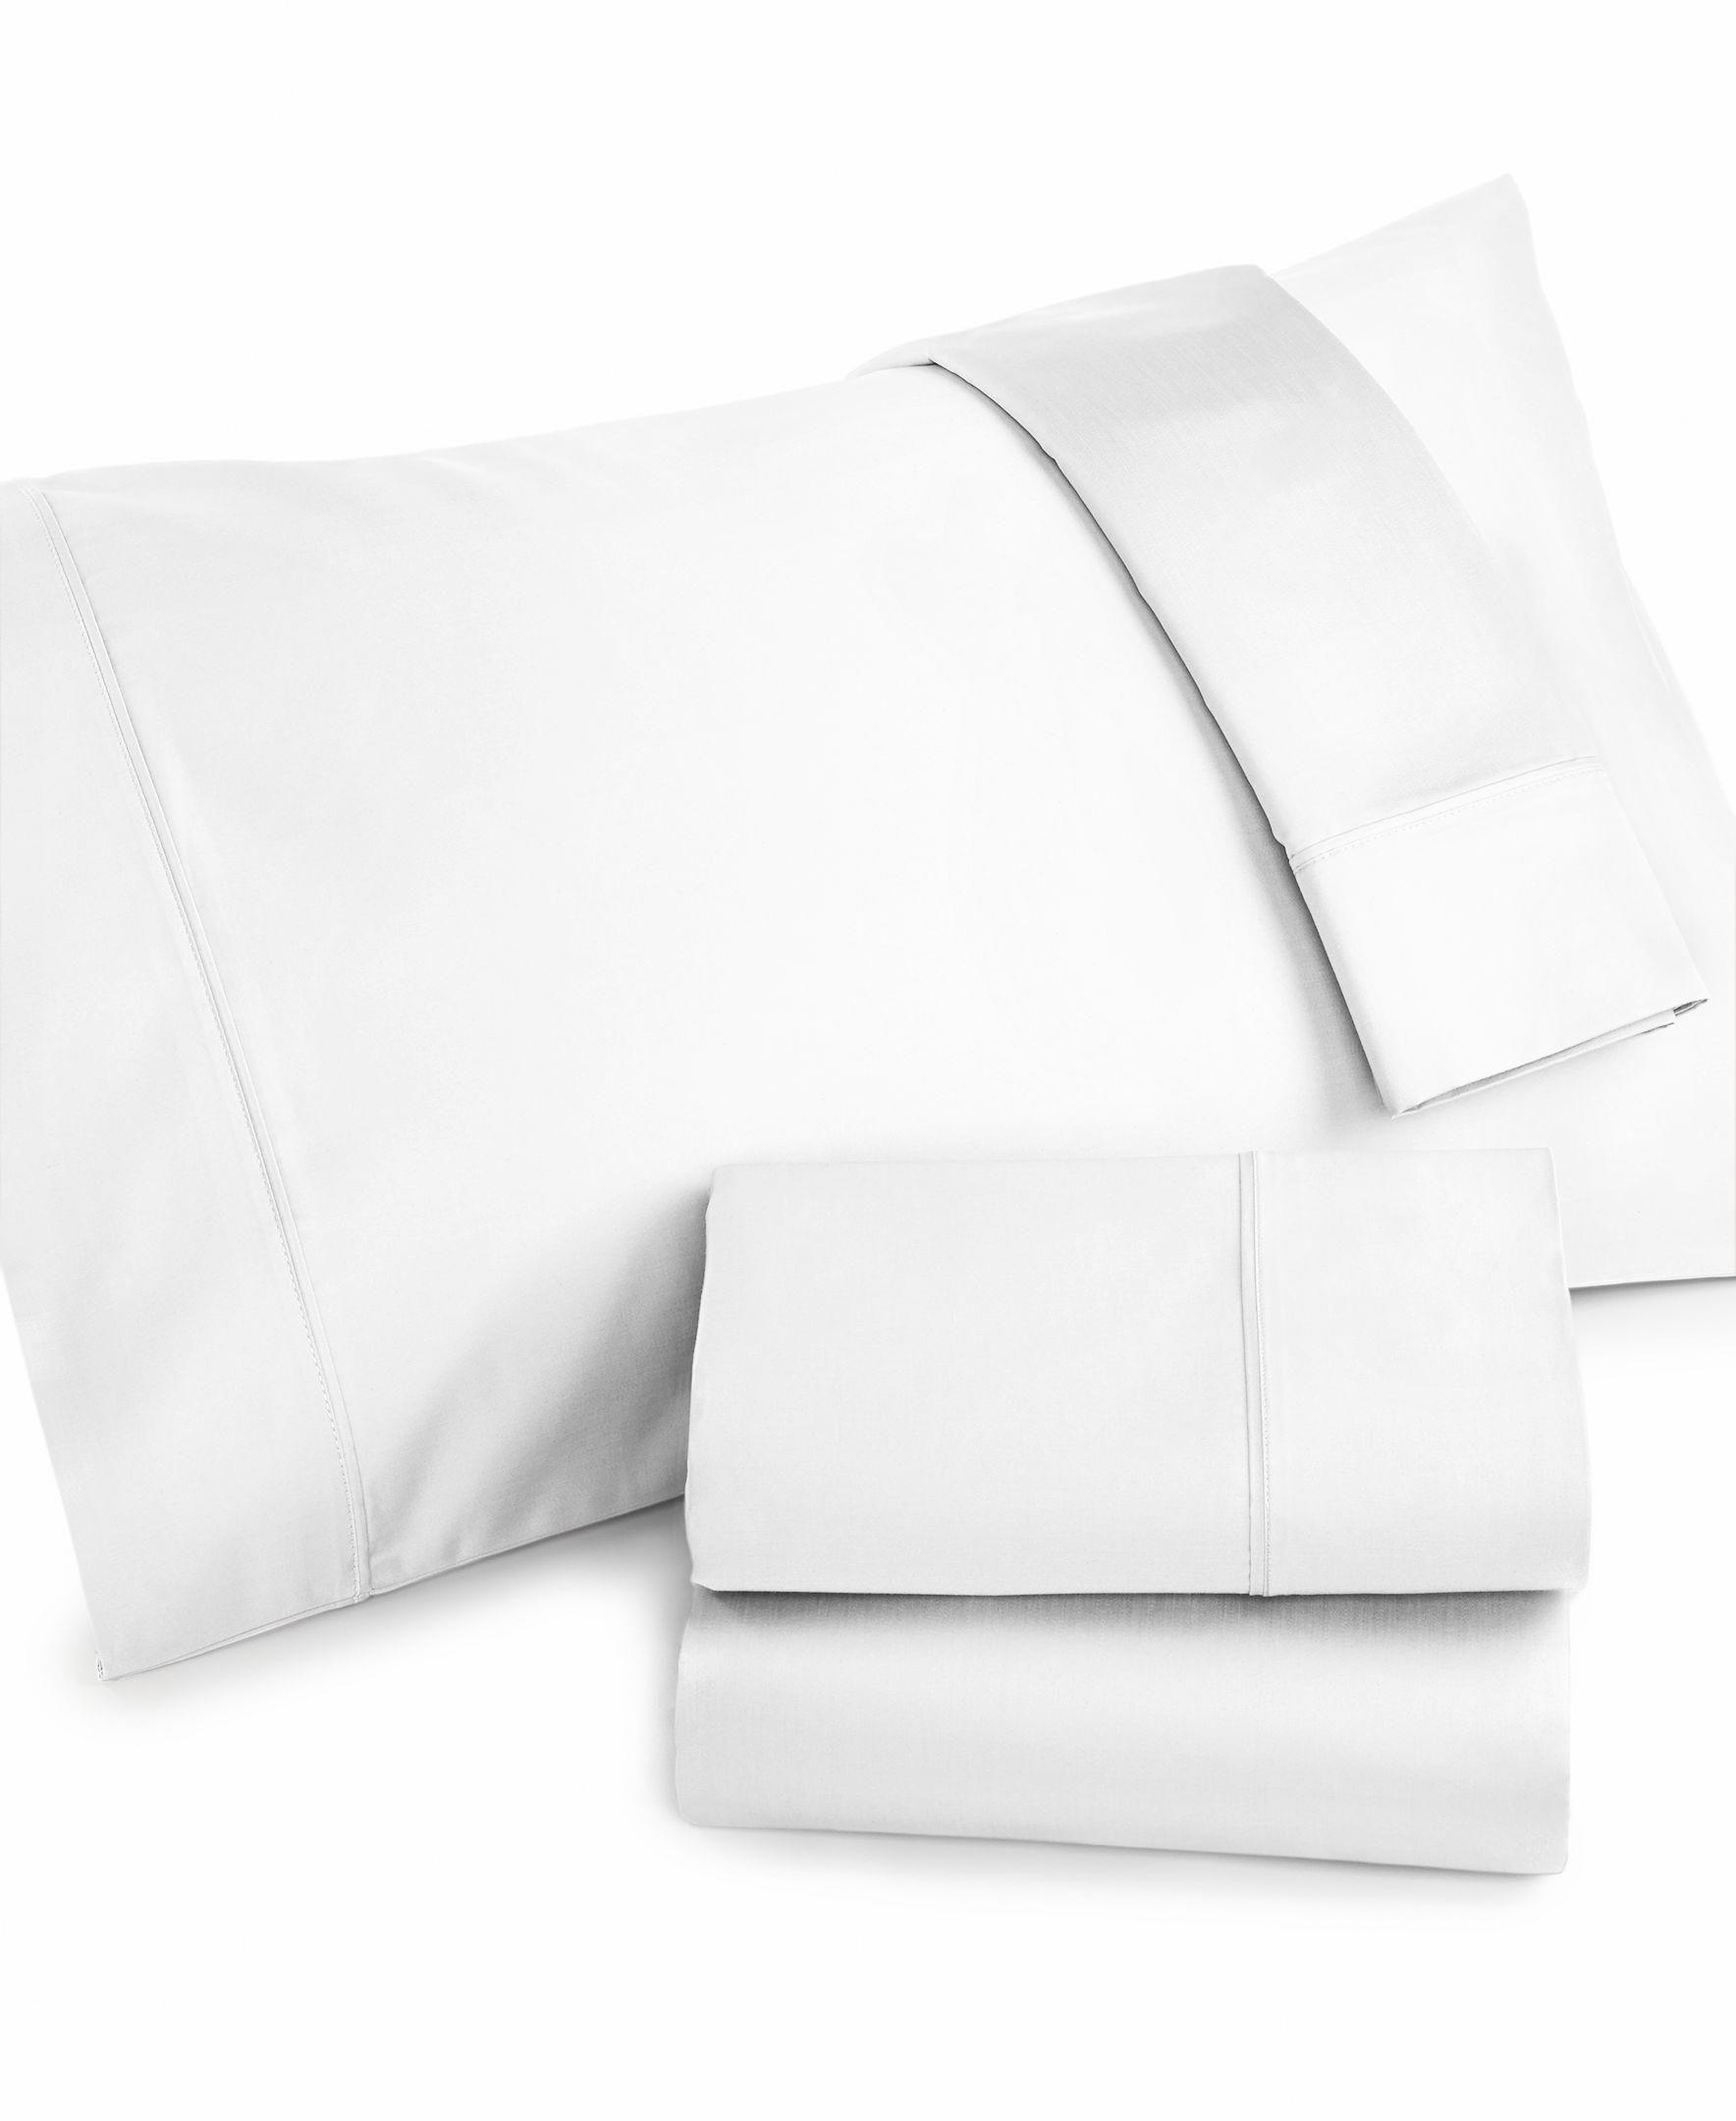 Best Bed Linens In The World Luxurybeddingkingsize Refferal 2202743715 Bedsheets2018